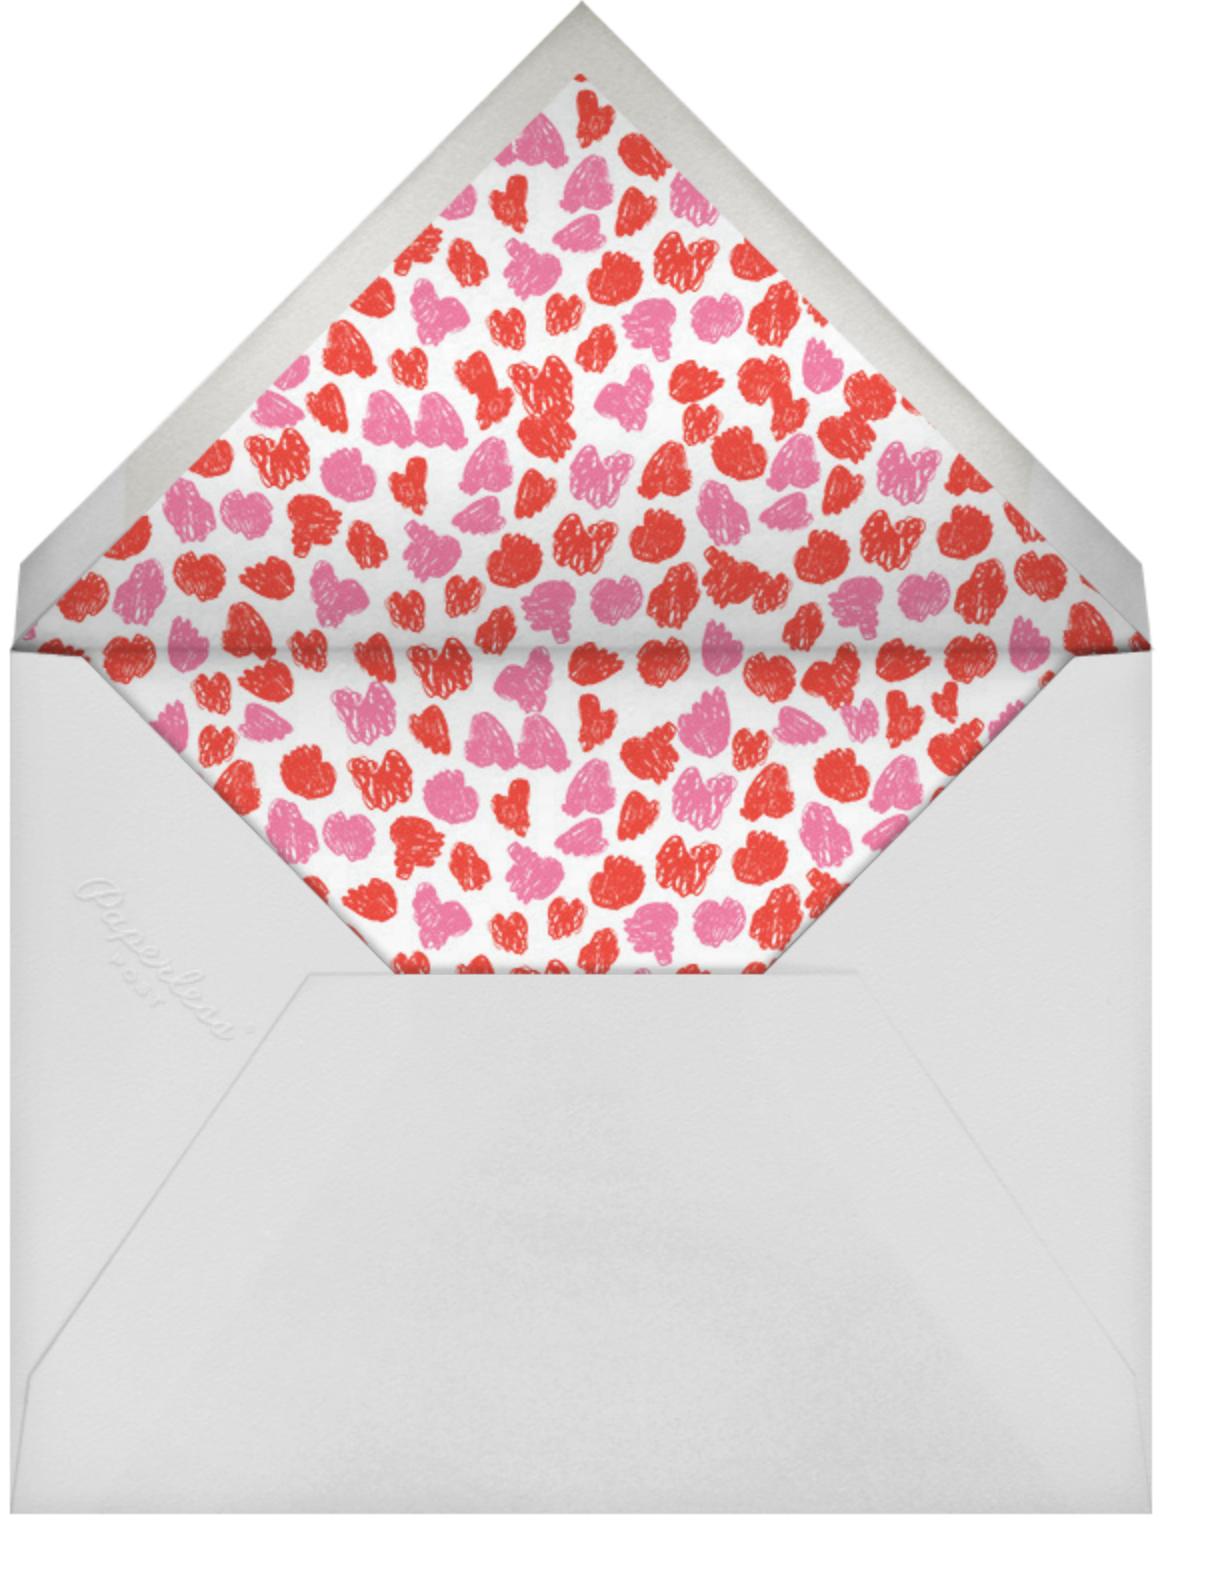 Grinning and Glowing  - Mr. Boddington's Studio - Christmas - envelope back